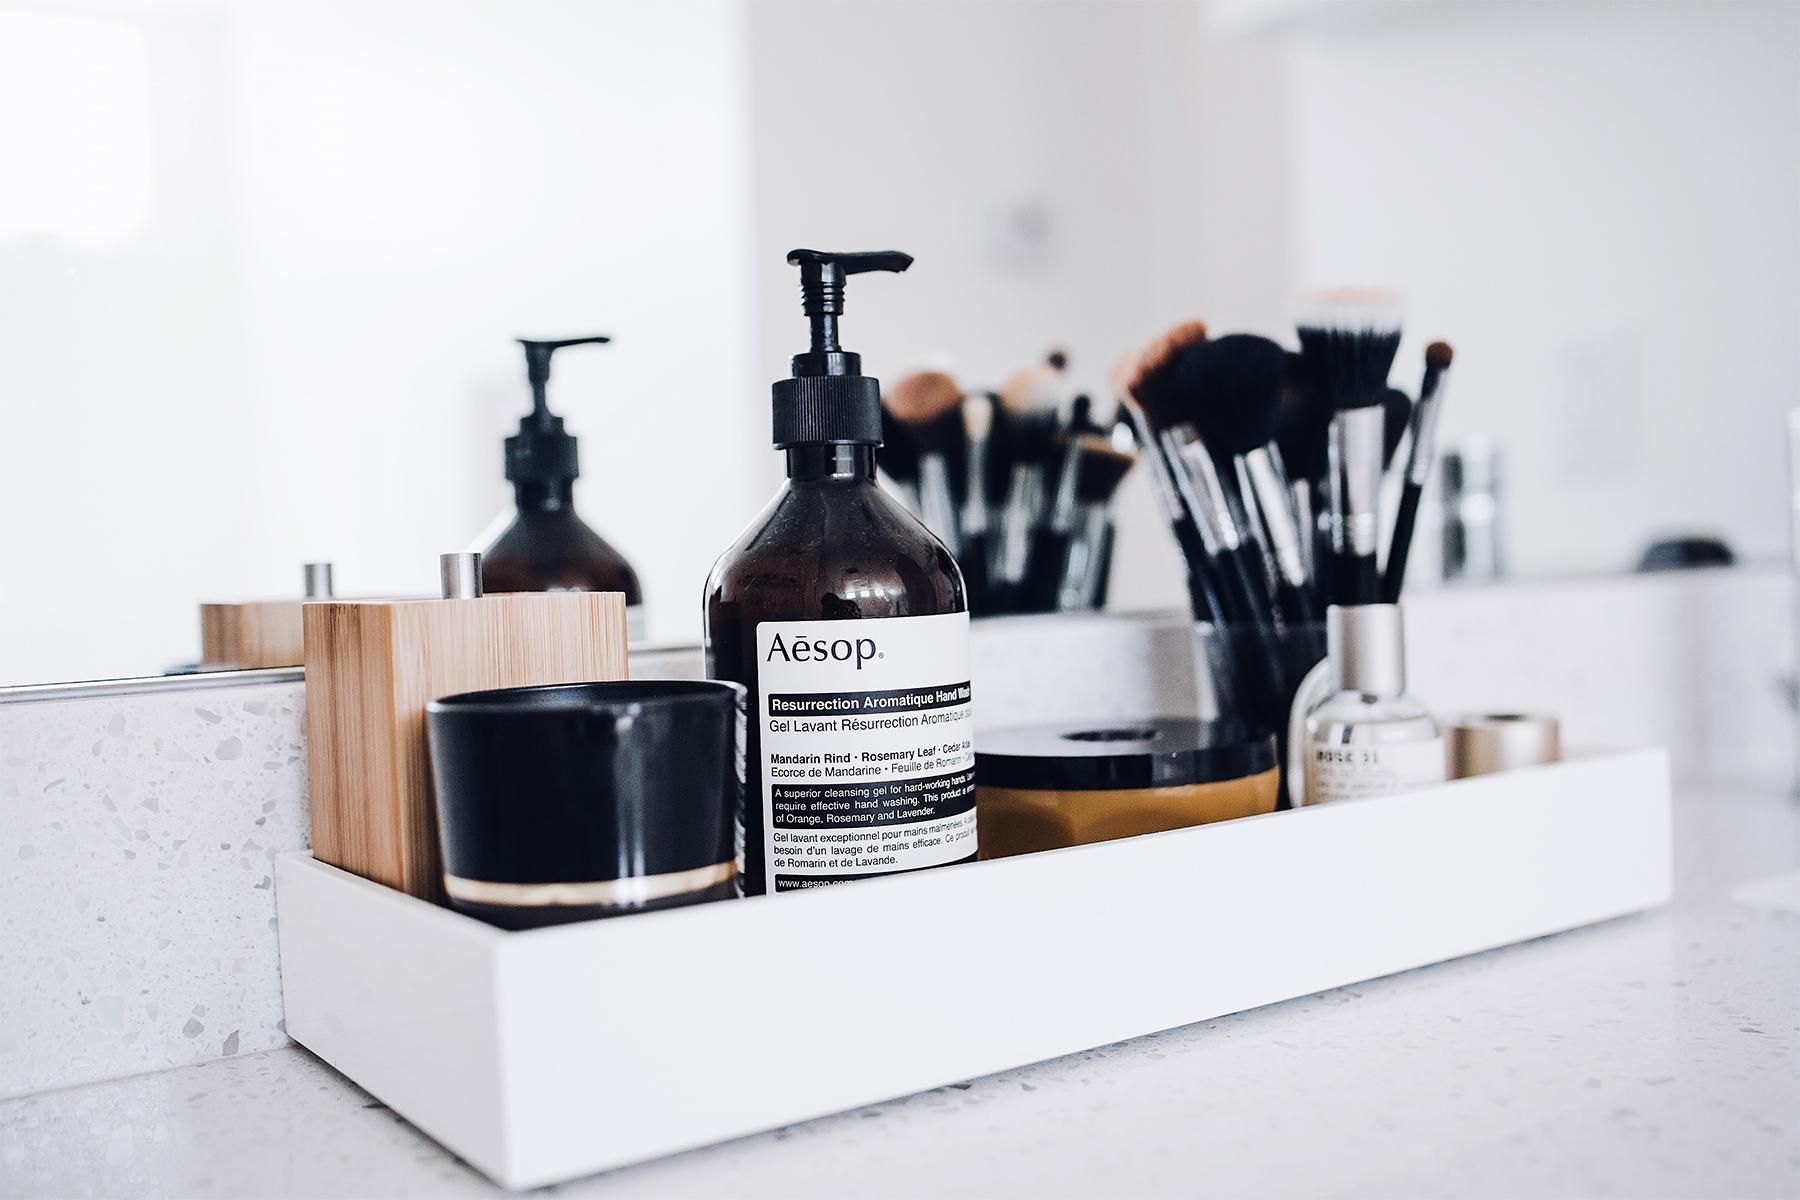 Fashion Jackson Daily Makeup Beauty Routine Sigma Makeup Brushes